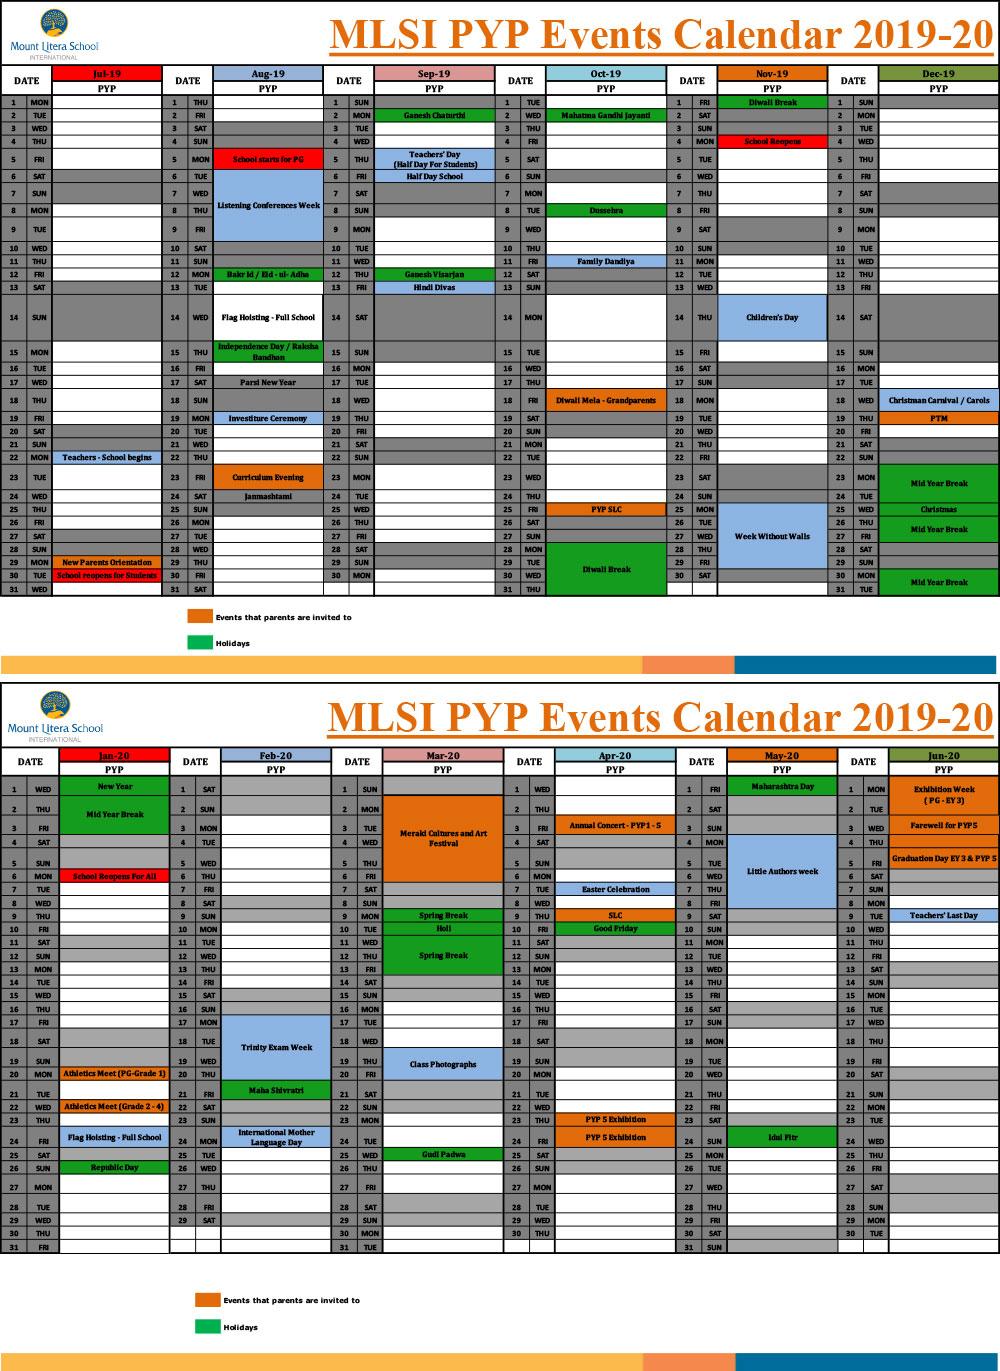 School Calendar – Mount Litera School International regarding Uti School Calendar